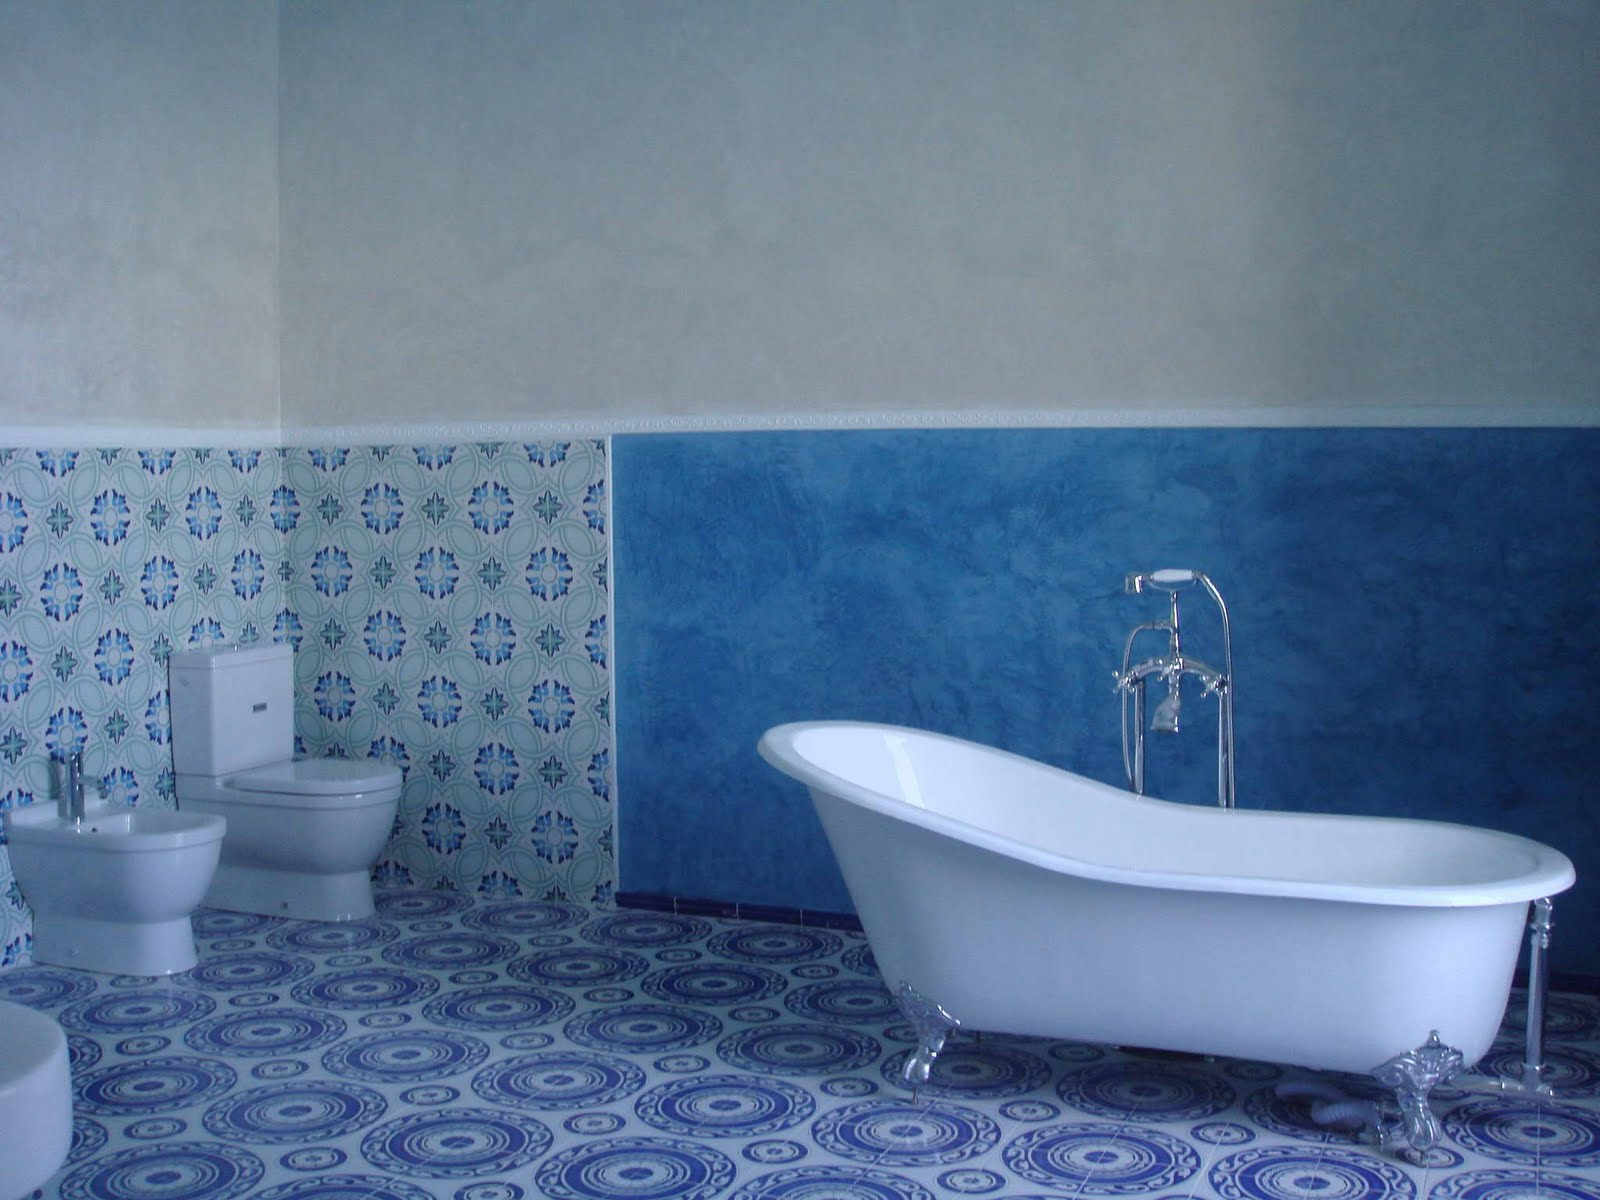 A Bathroom Vision in Blue